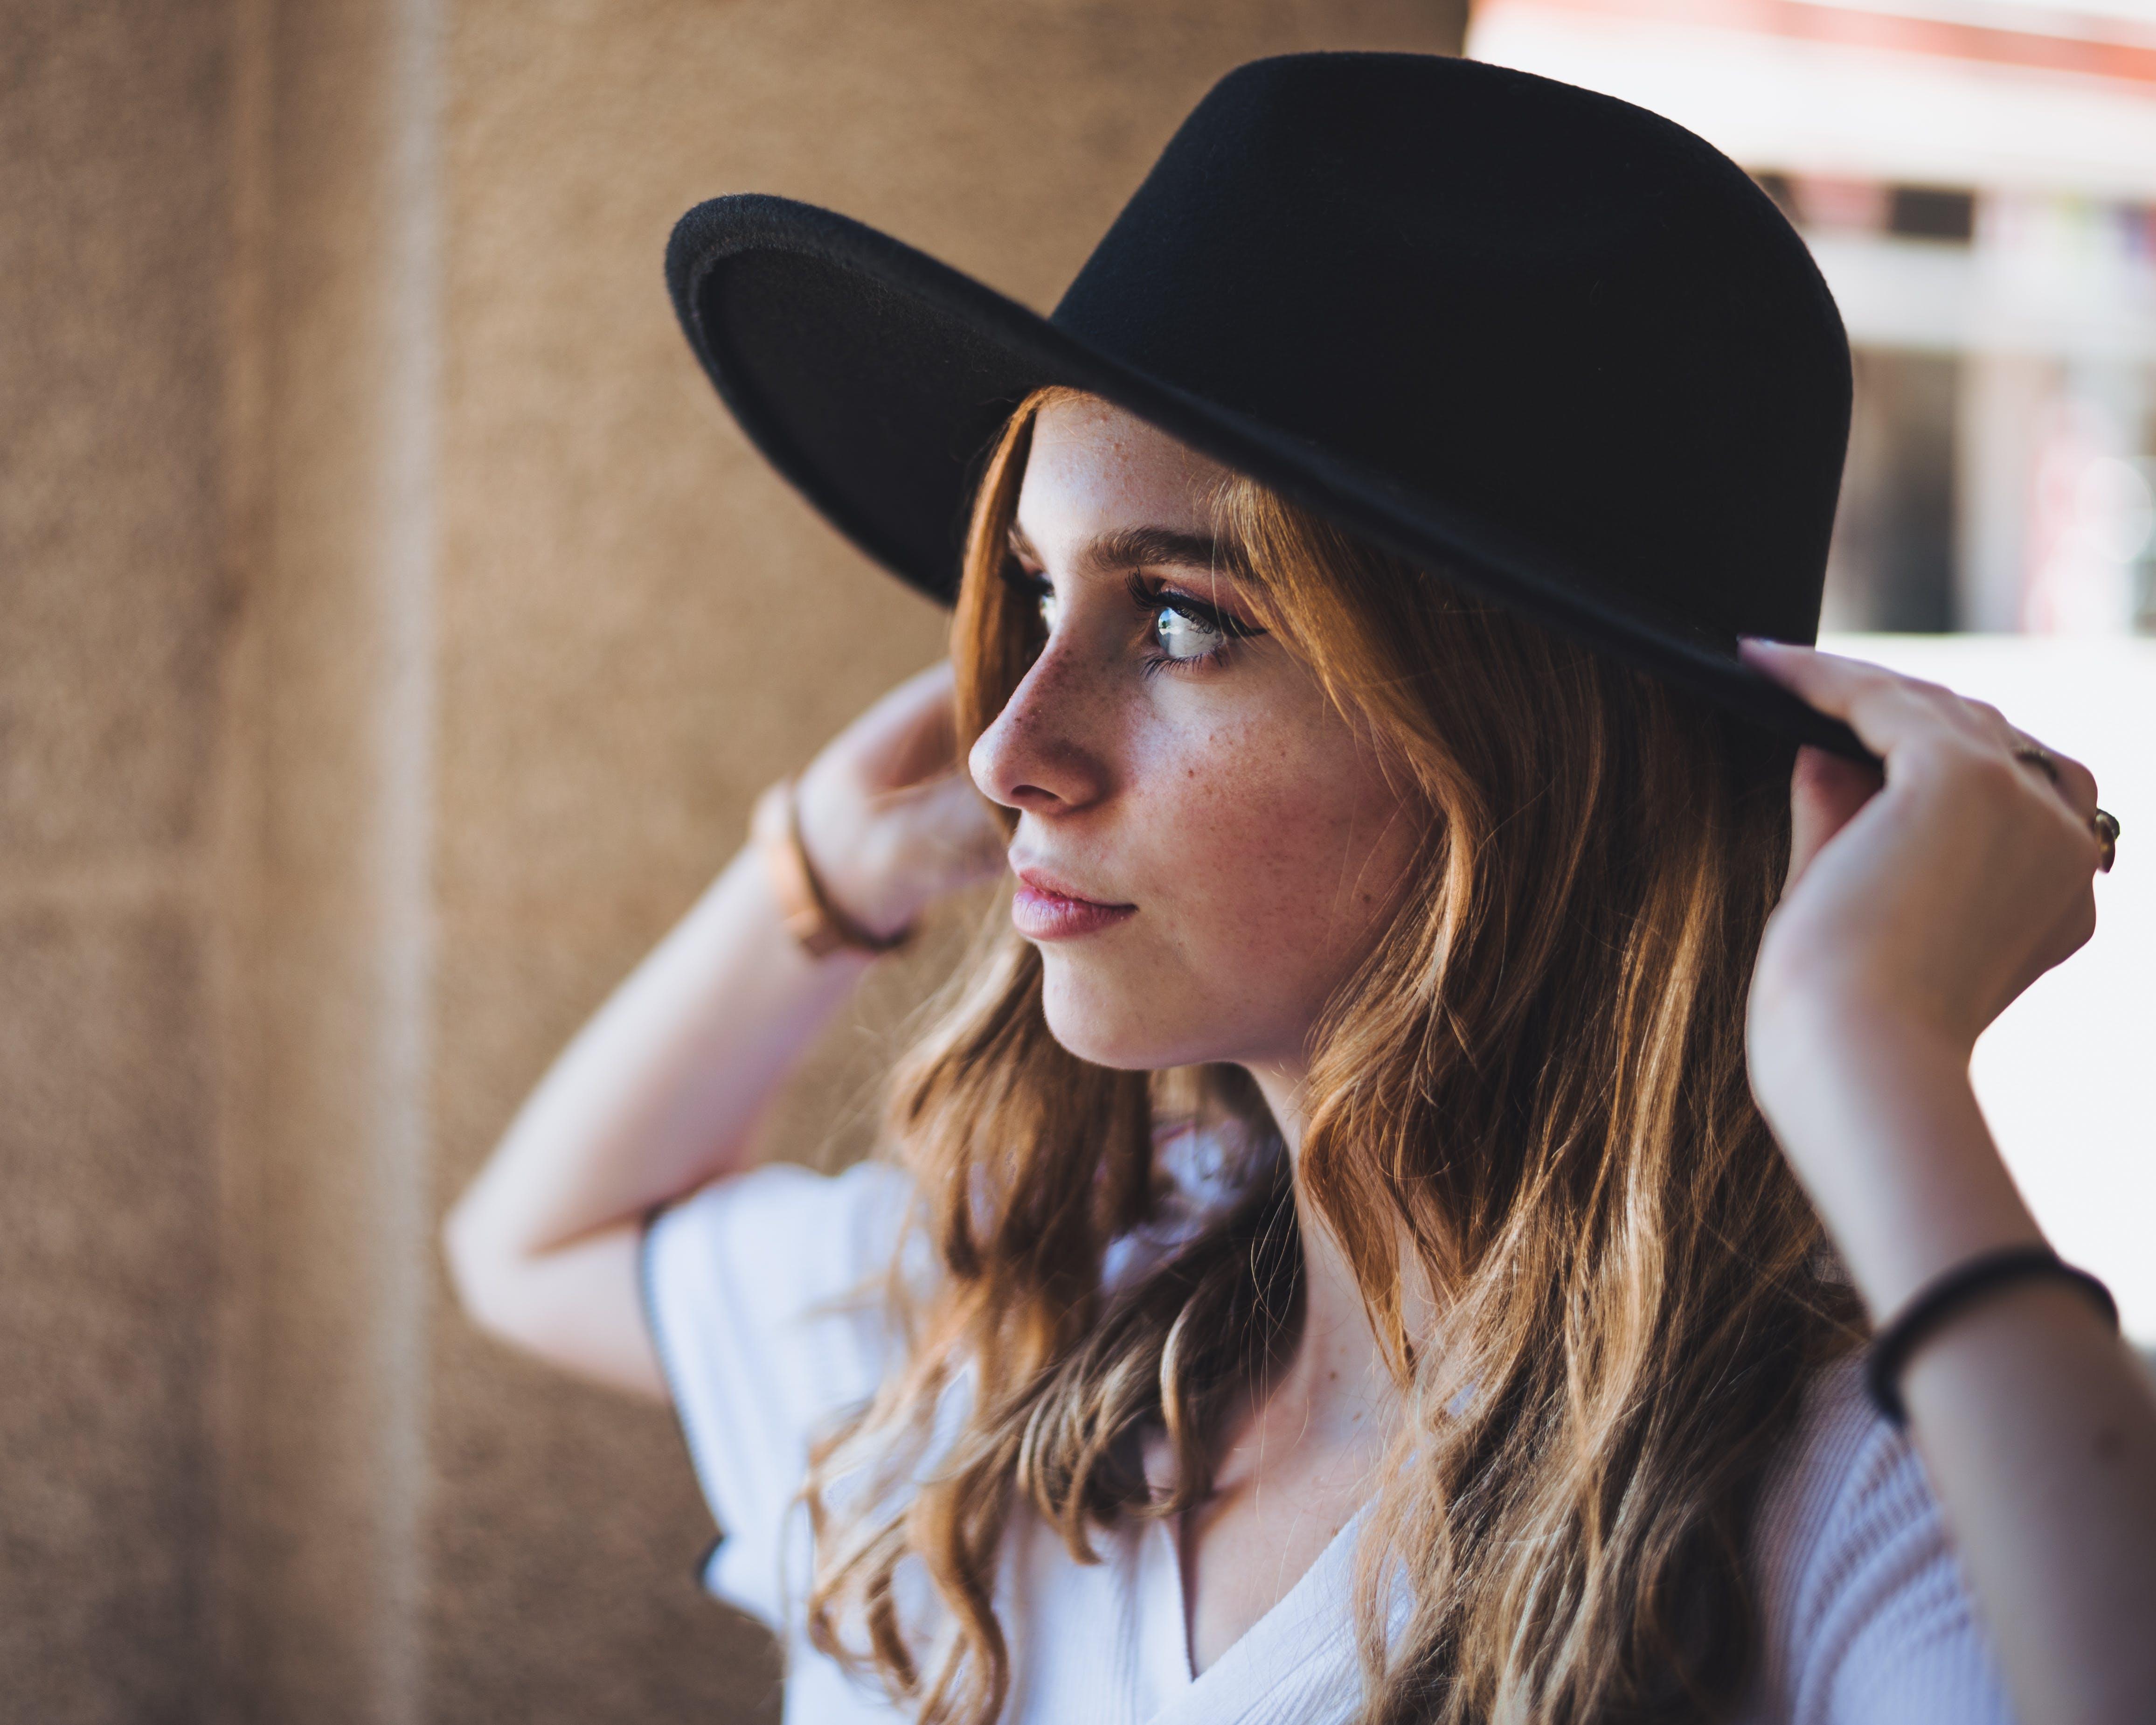 Close-Up Photo of Woman Wearing Fedora Hat